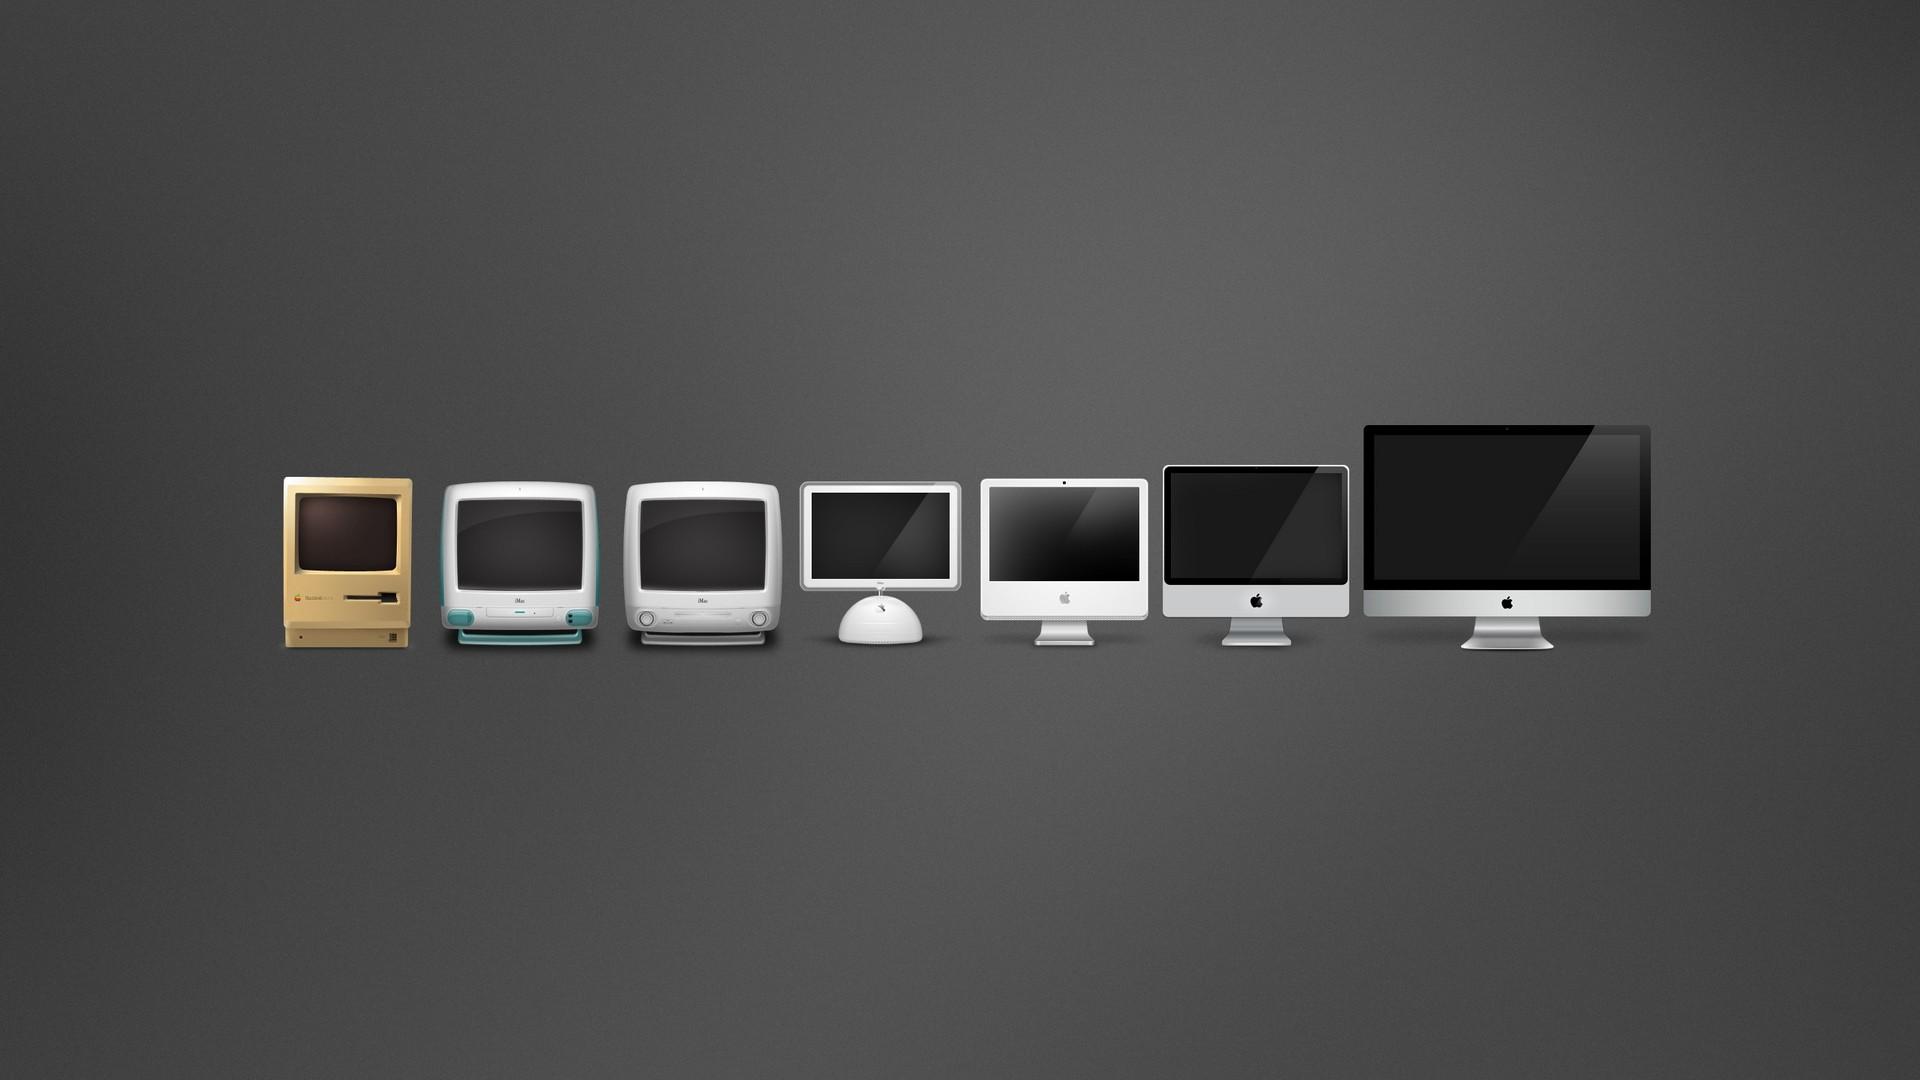 1920x1080 Macintosh Evolution desktop PC and Mac wallpaper 1920x1080